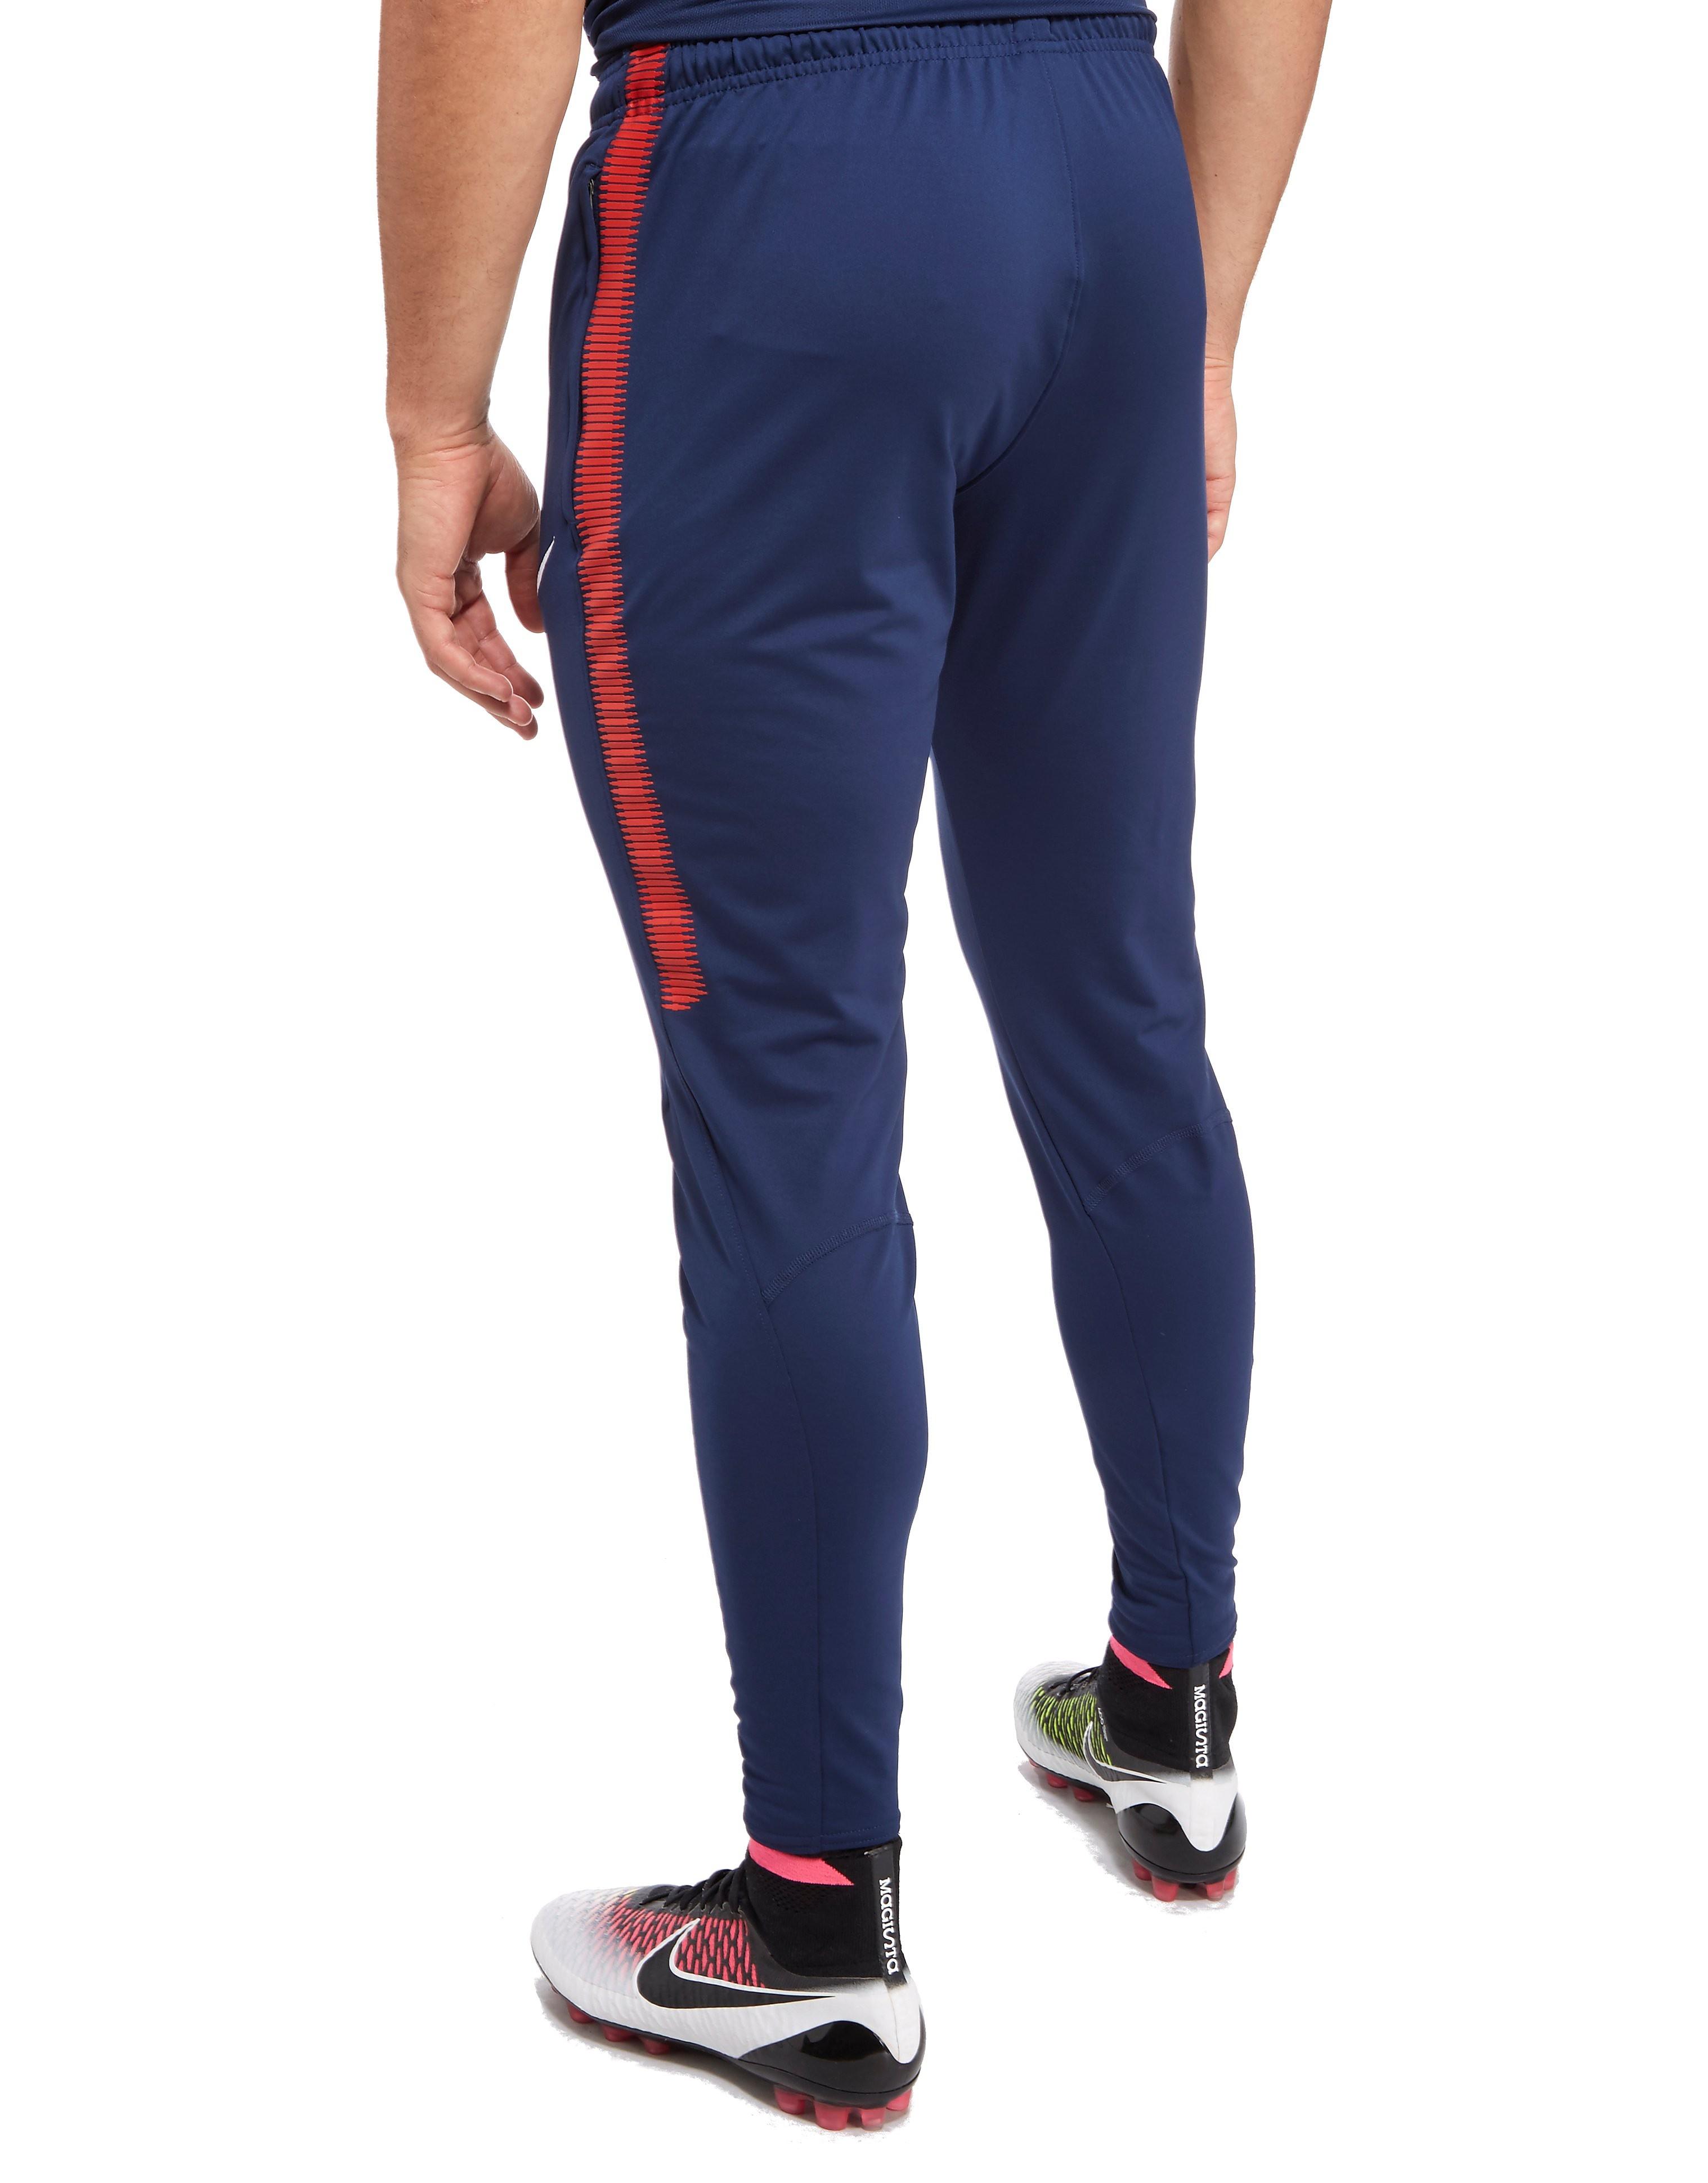 Nike Paris Saint Germain 2017/18 Squad Pants